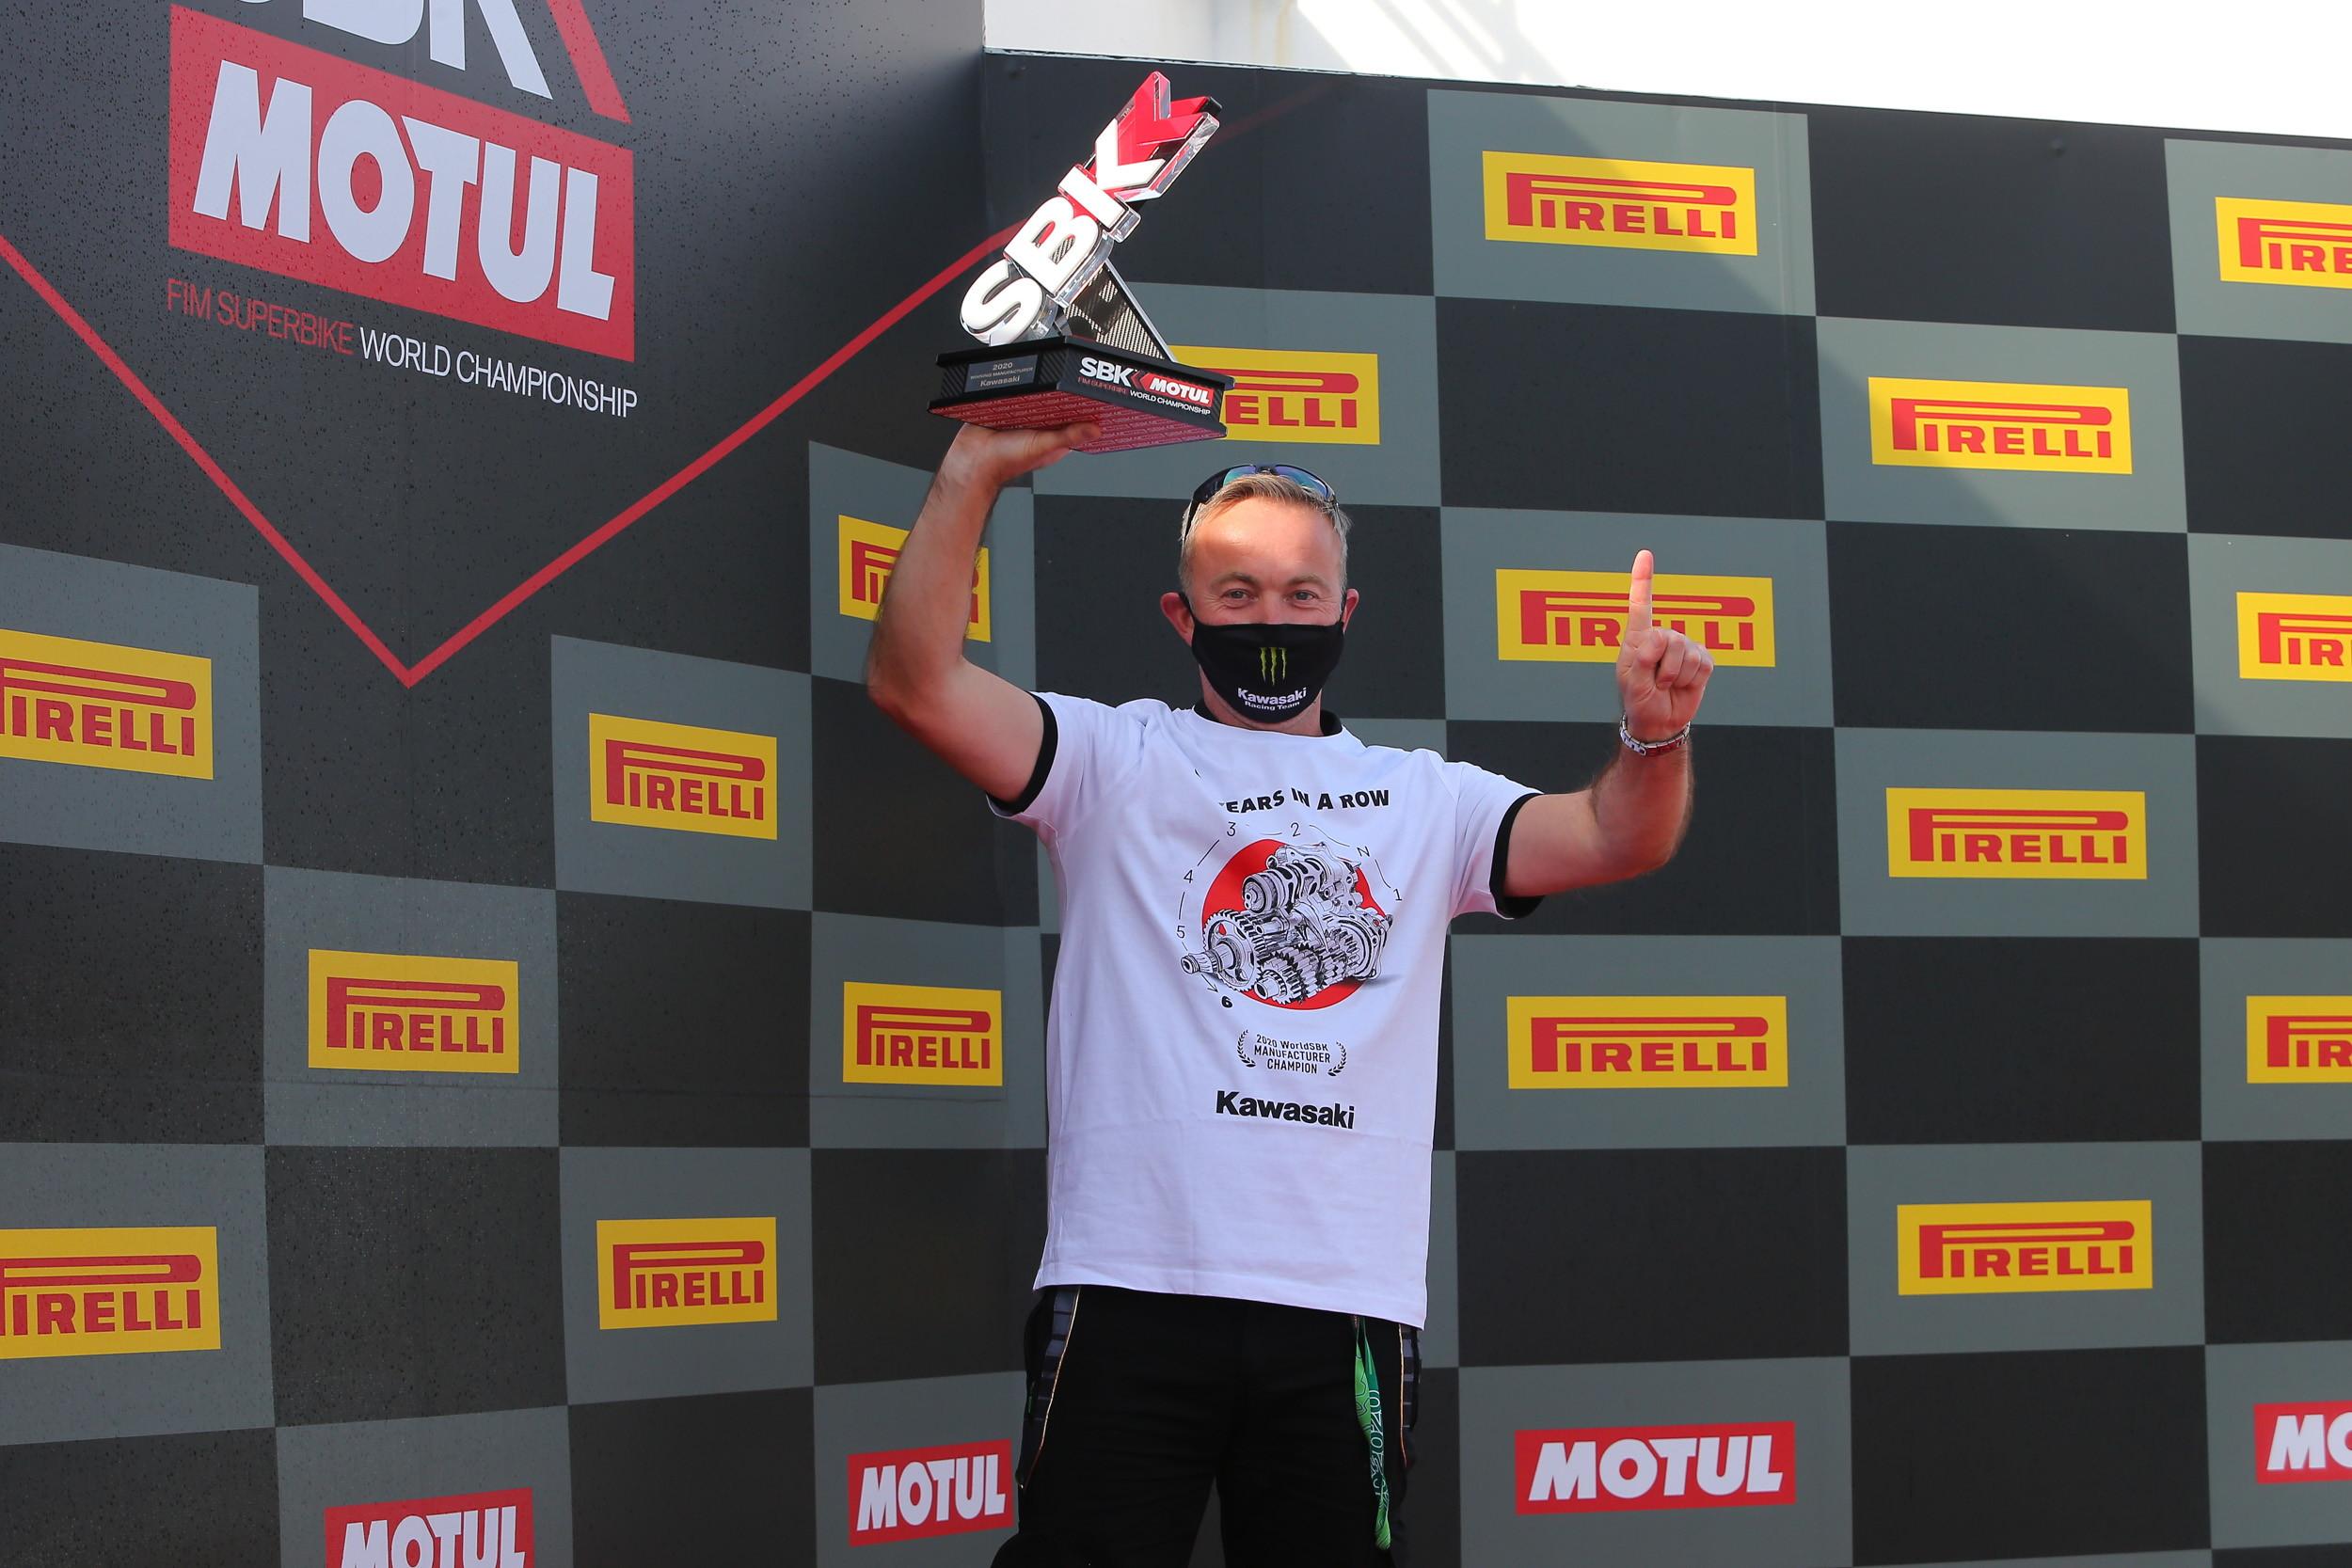 Kawasaki campione Superbike